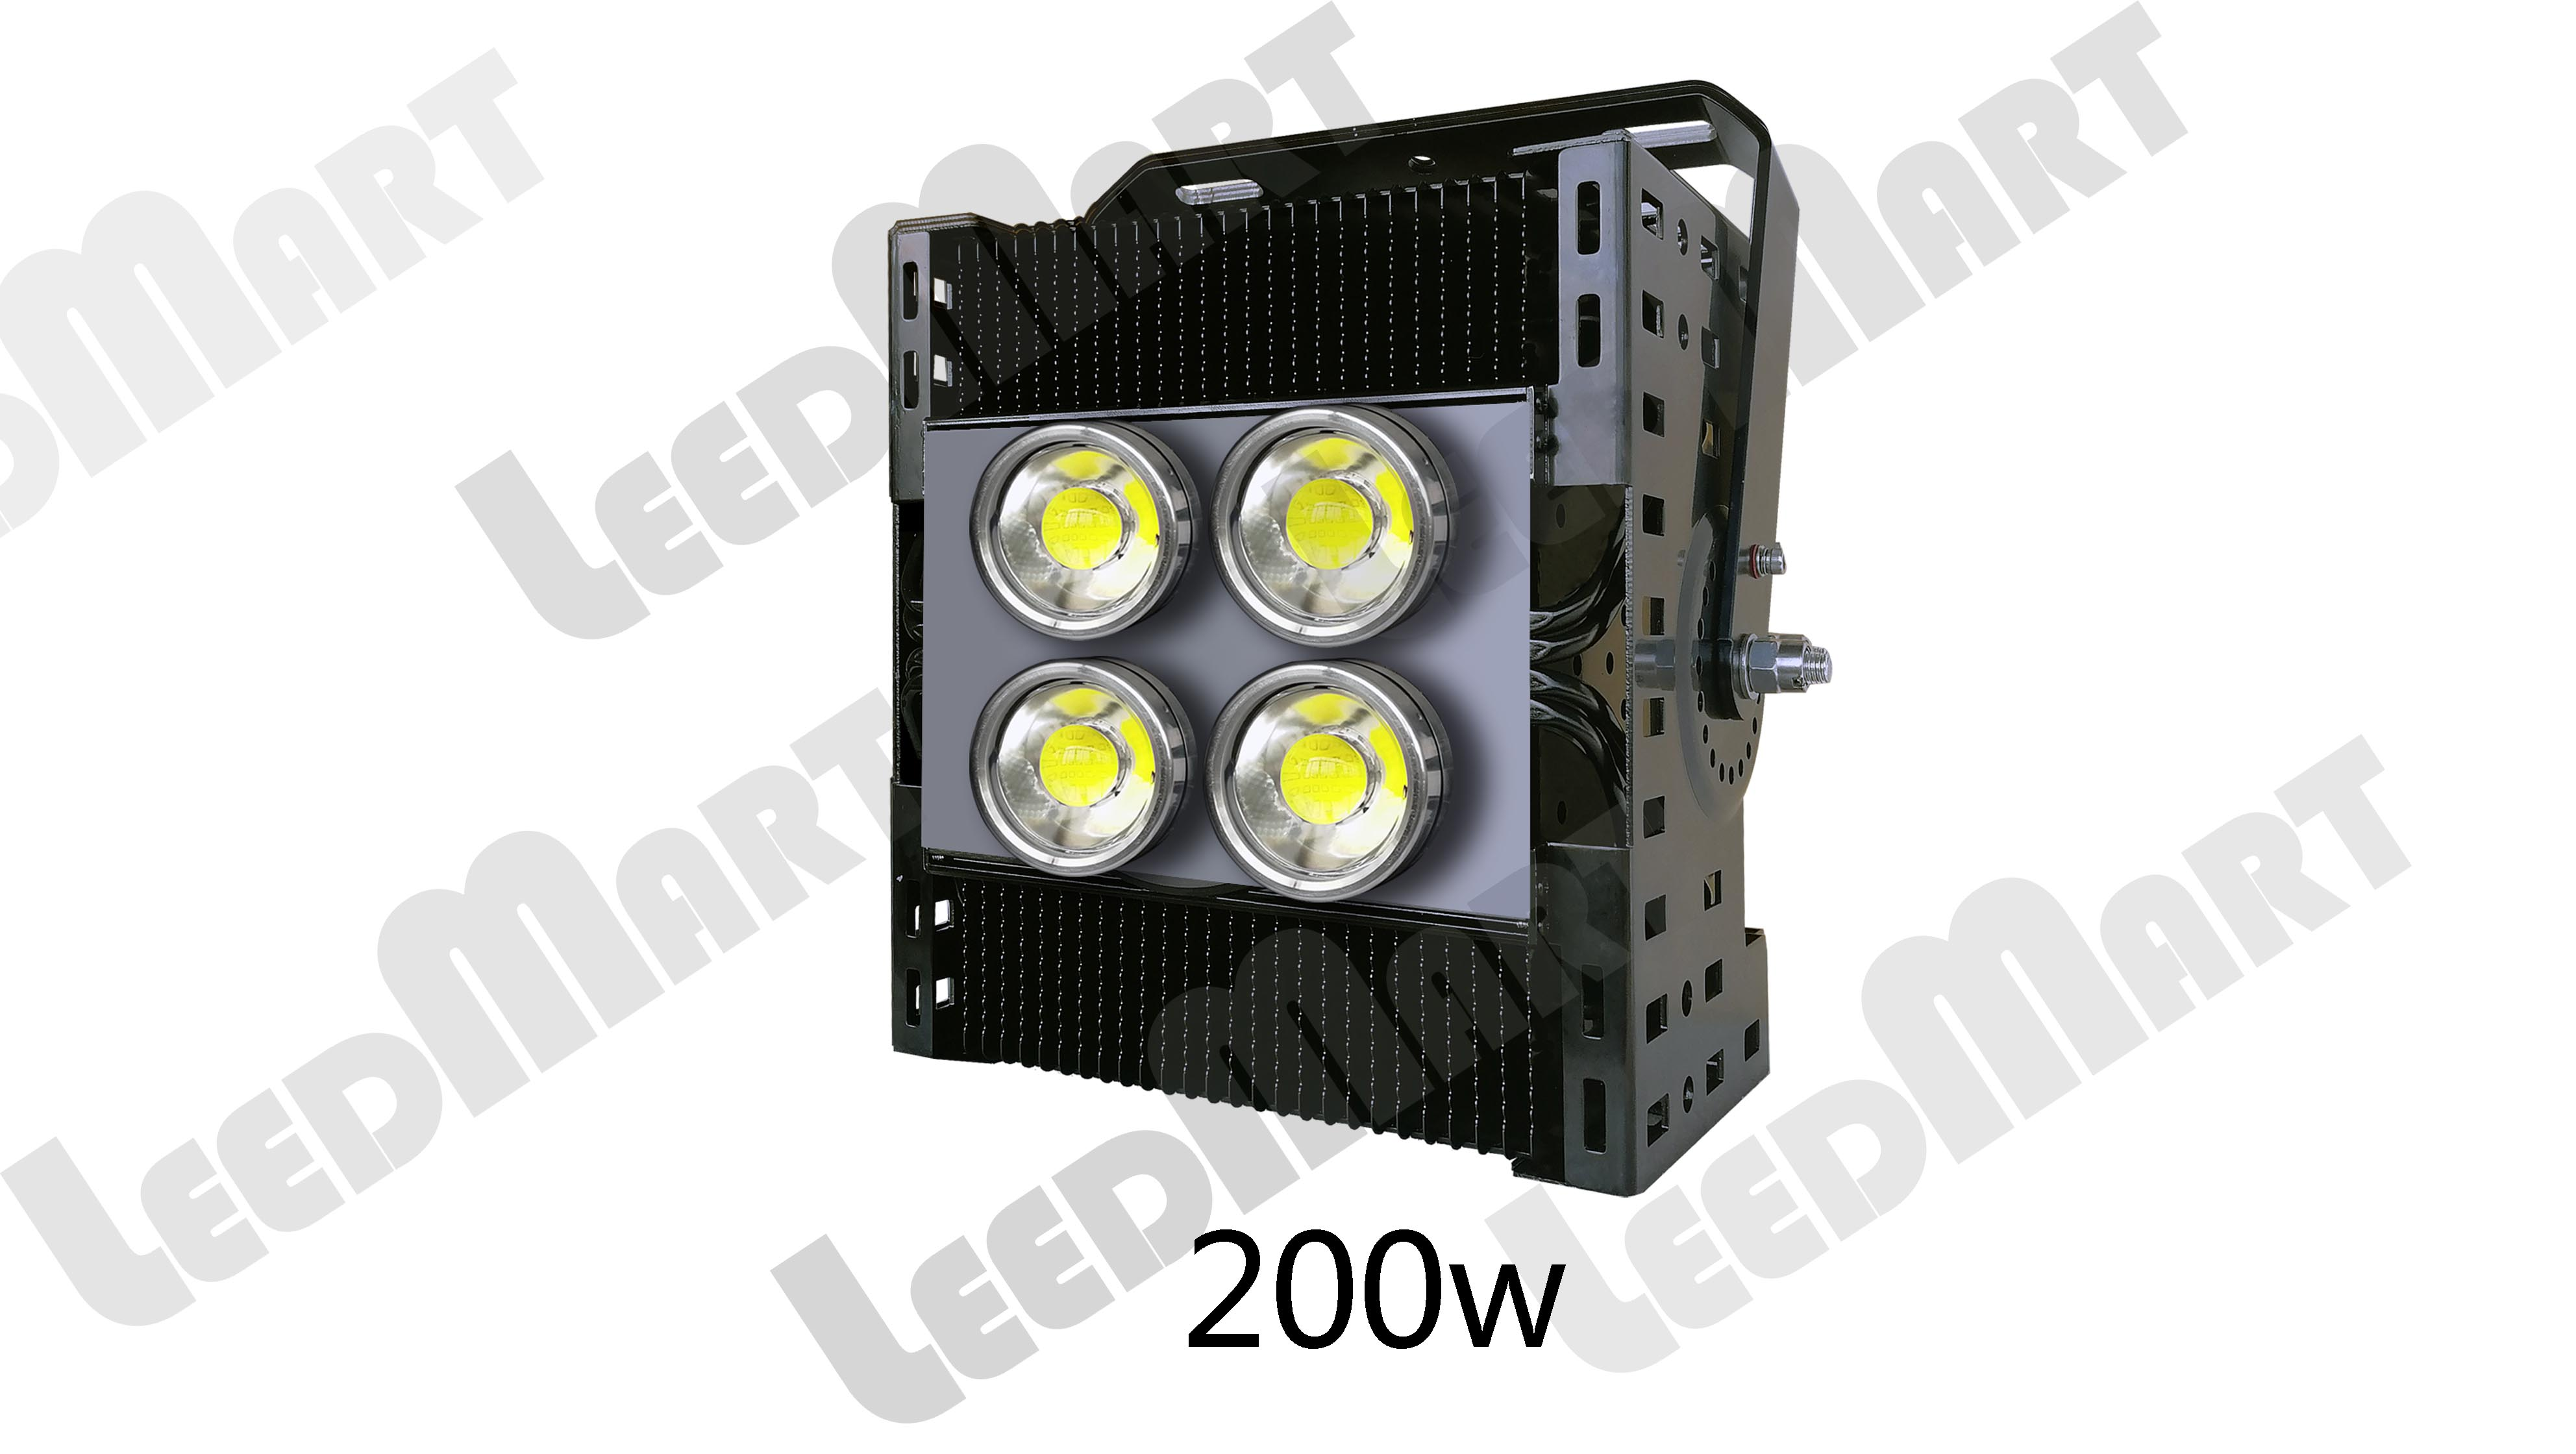 Multi-purpose LED high mast light flood light IP65 200 watt -1000 watt 130000 lumen